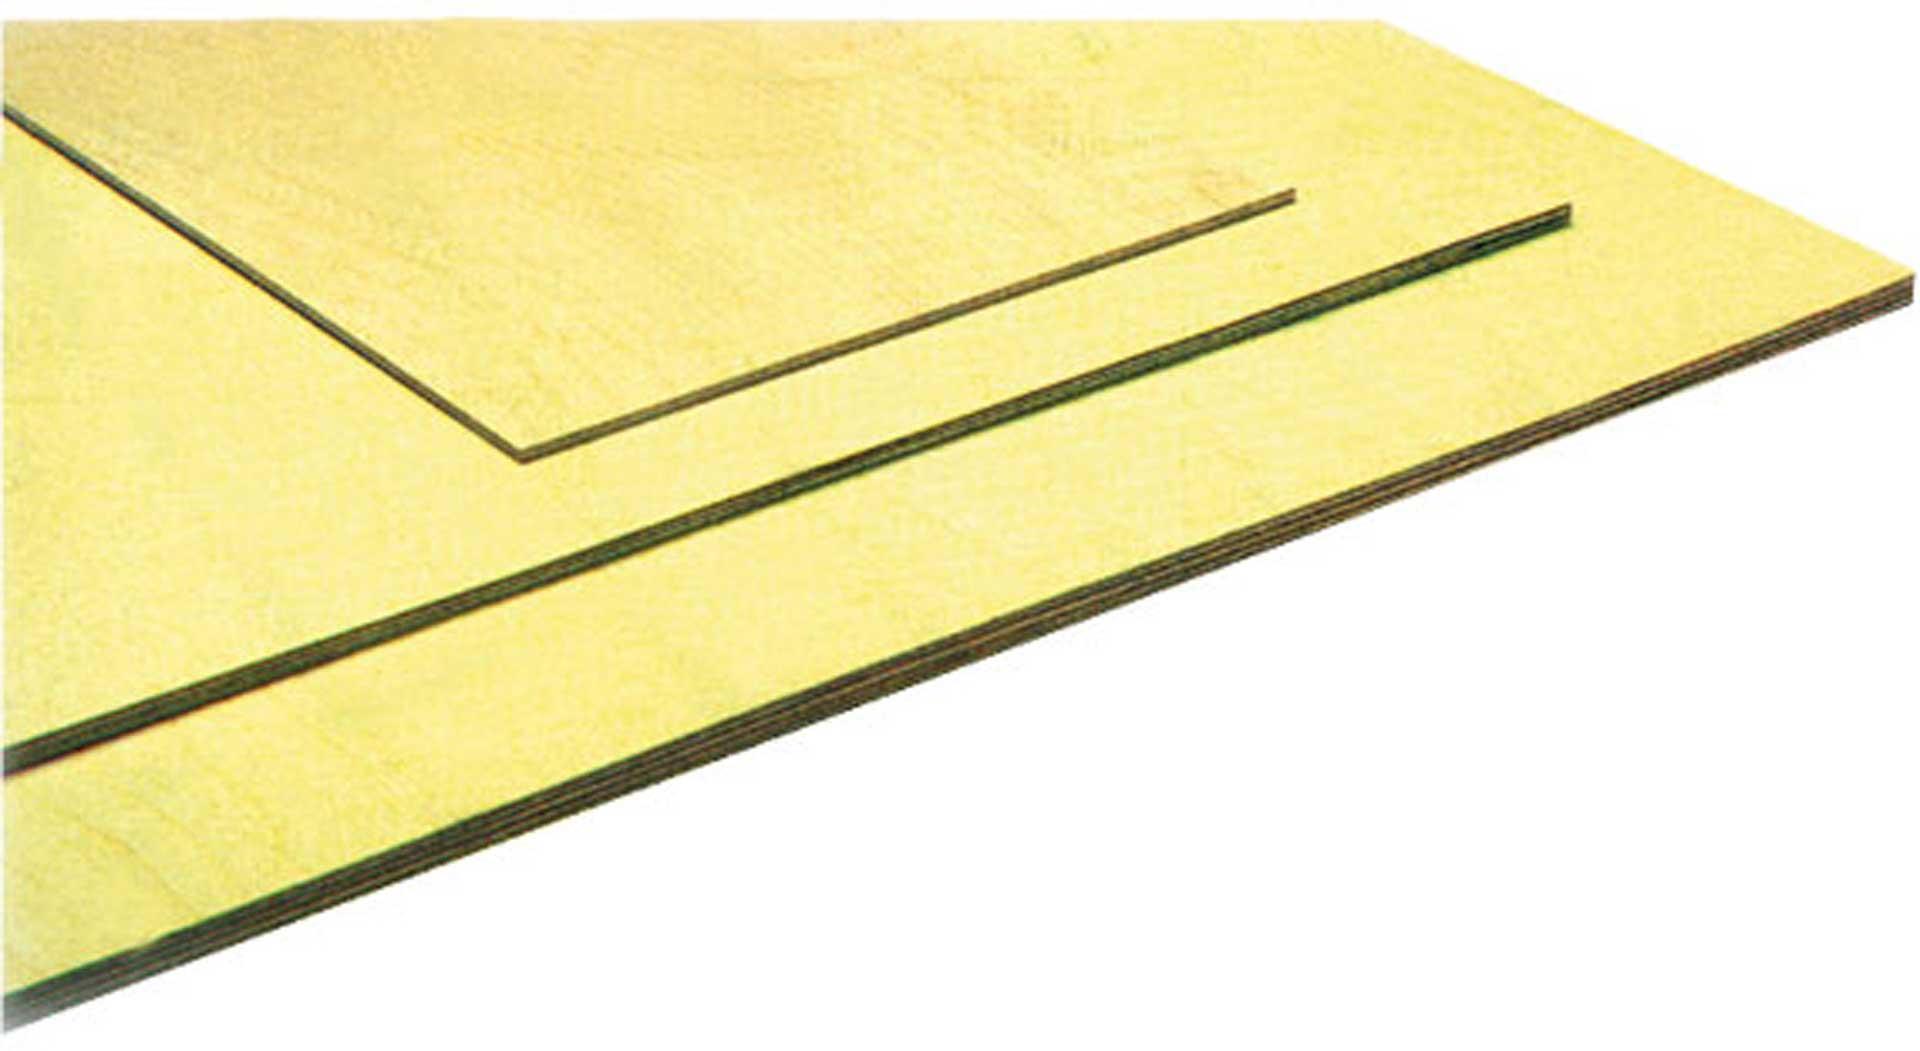 MODELLBAU LINDINGER BIRCH-SPERRY 3,0/300/1000MM